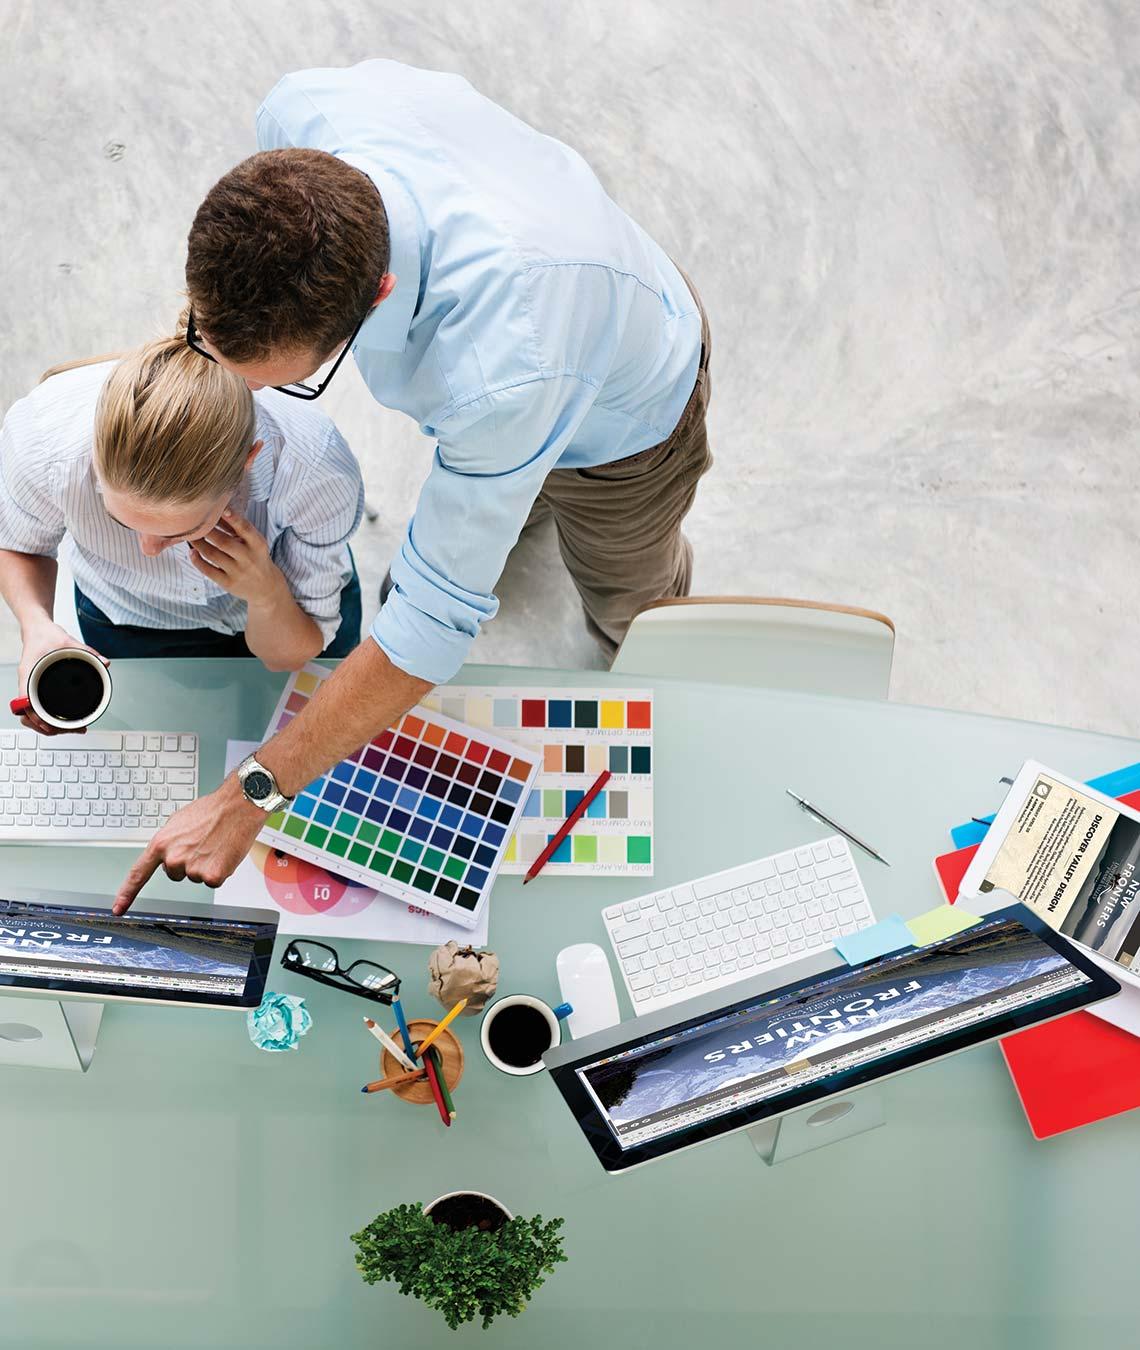 Bachelor Of Design | Graphic And Digital Design Bachelor Of Fine Arts University Of